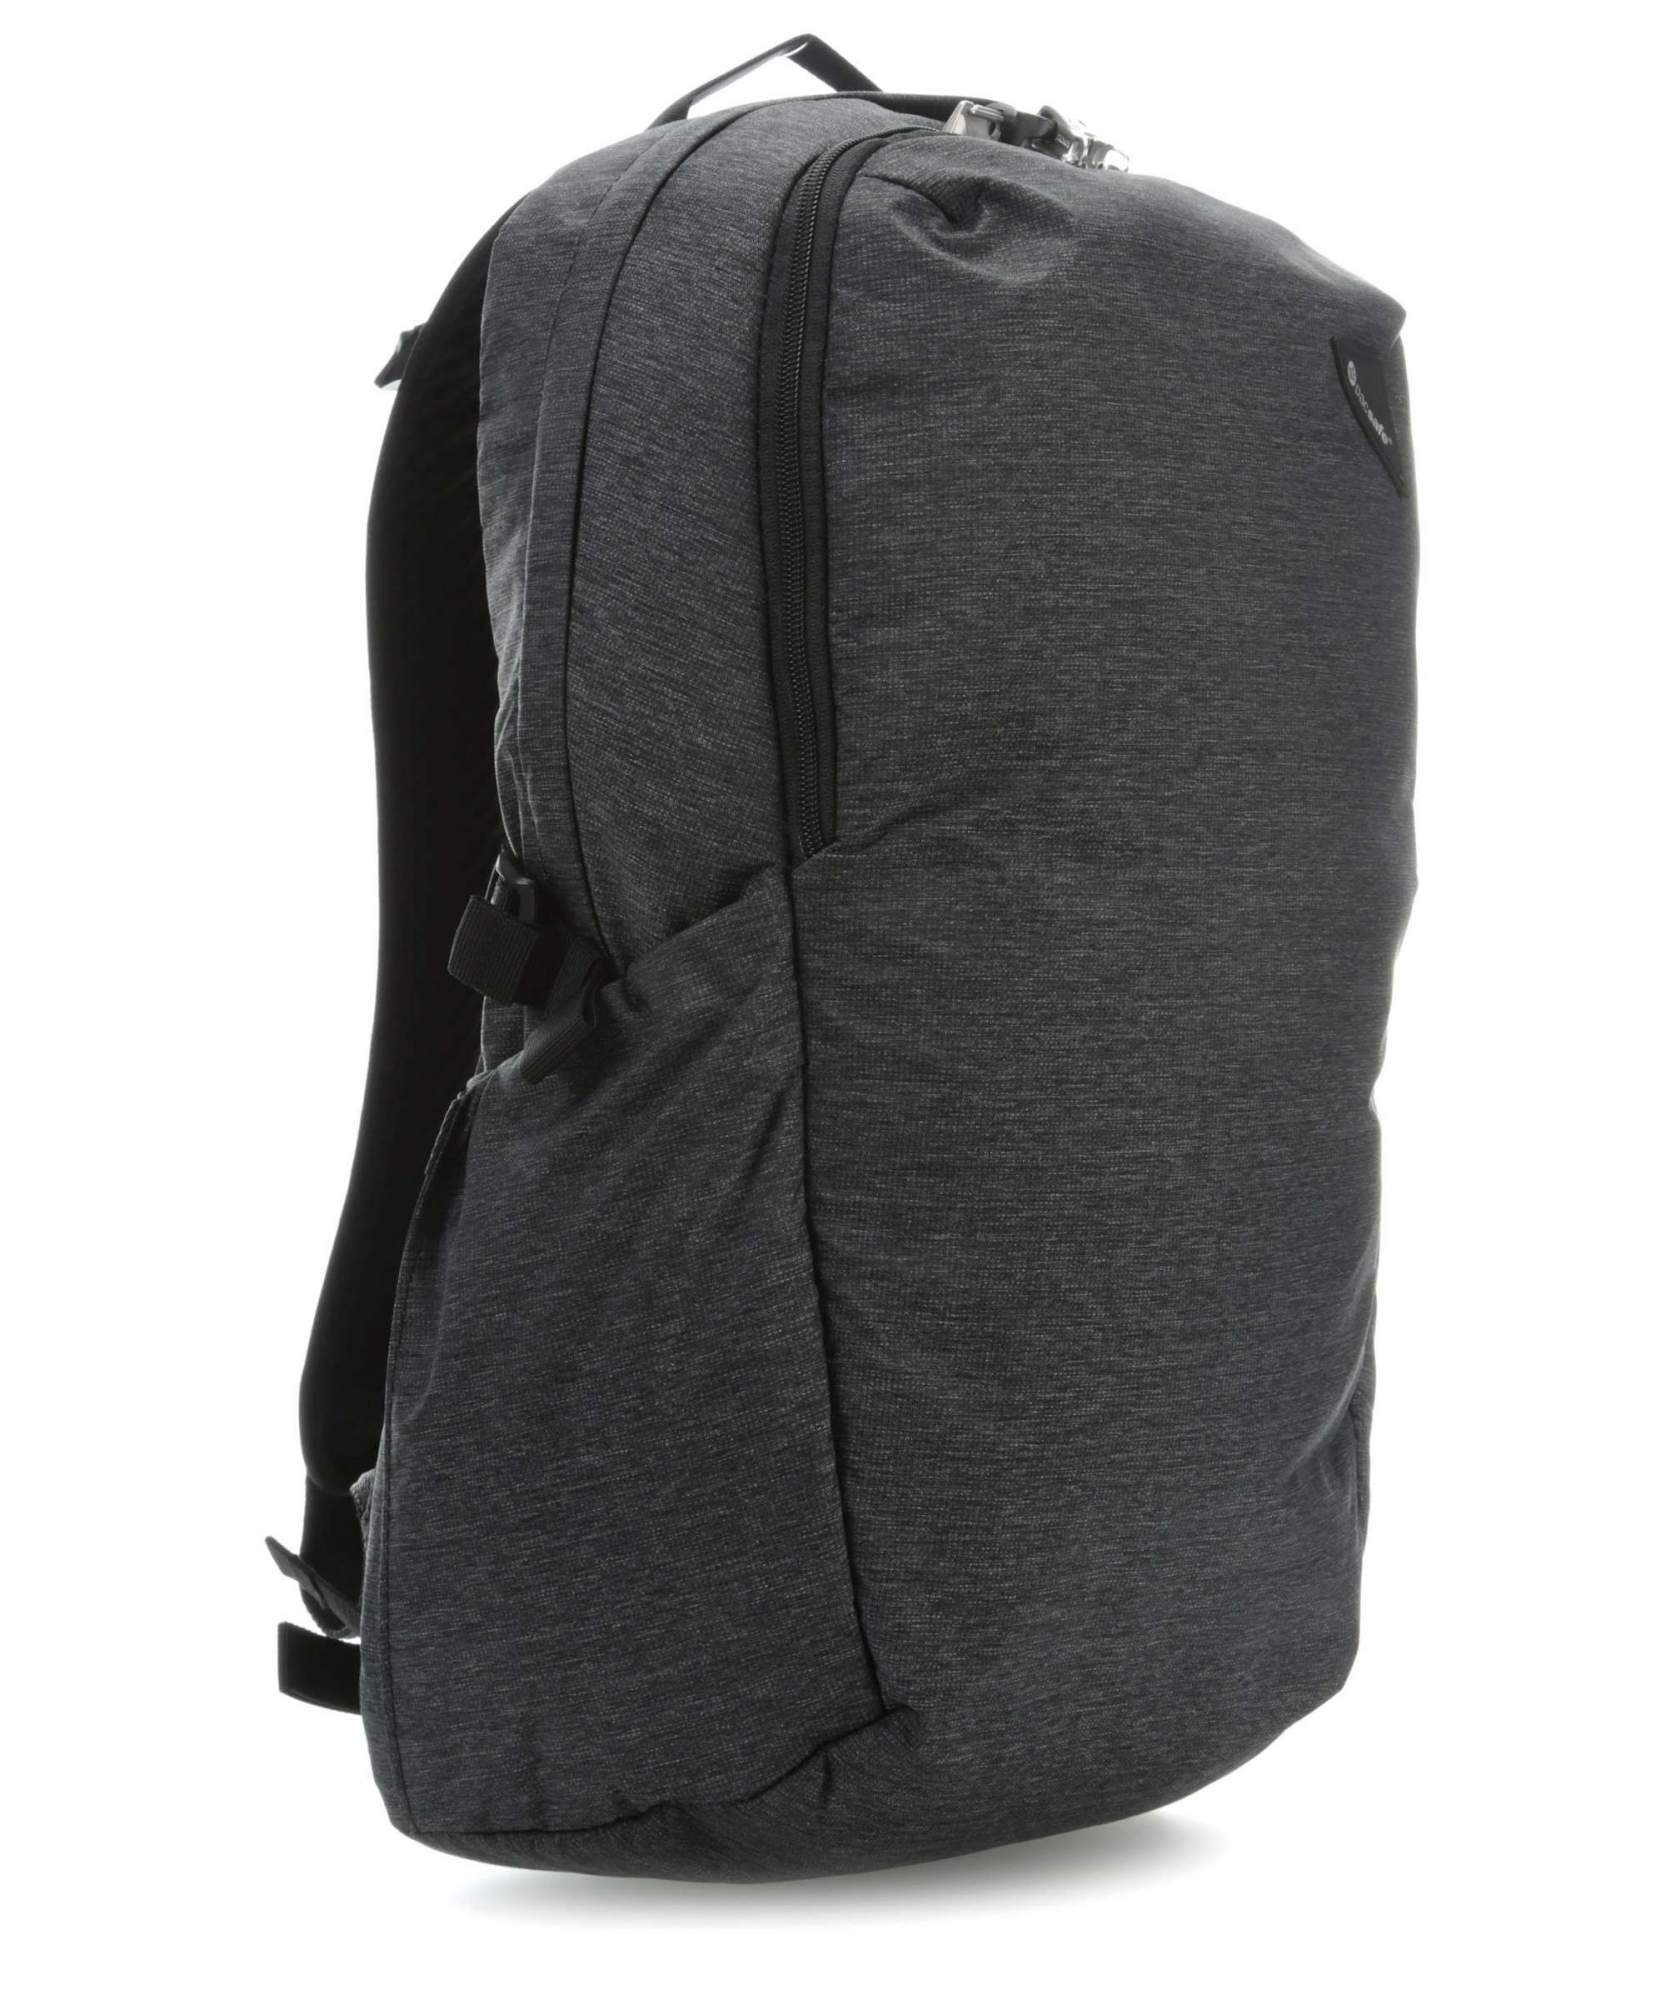 Рюкзак Pacsafe Vibe 25 л серый 60301129